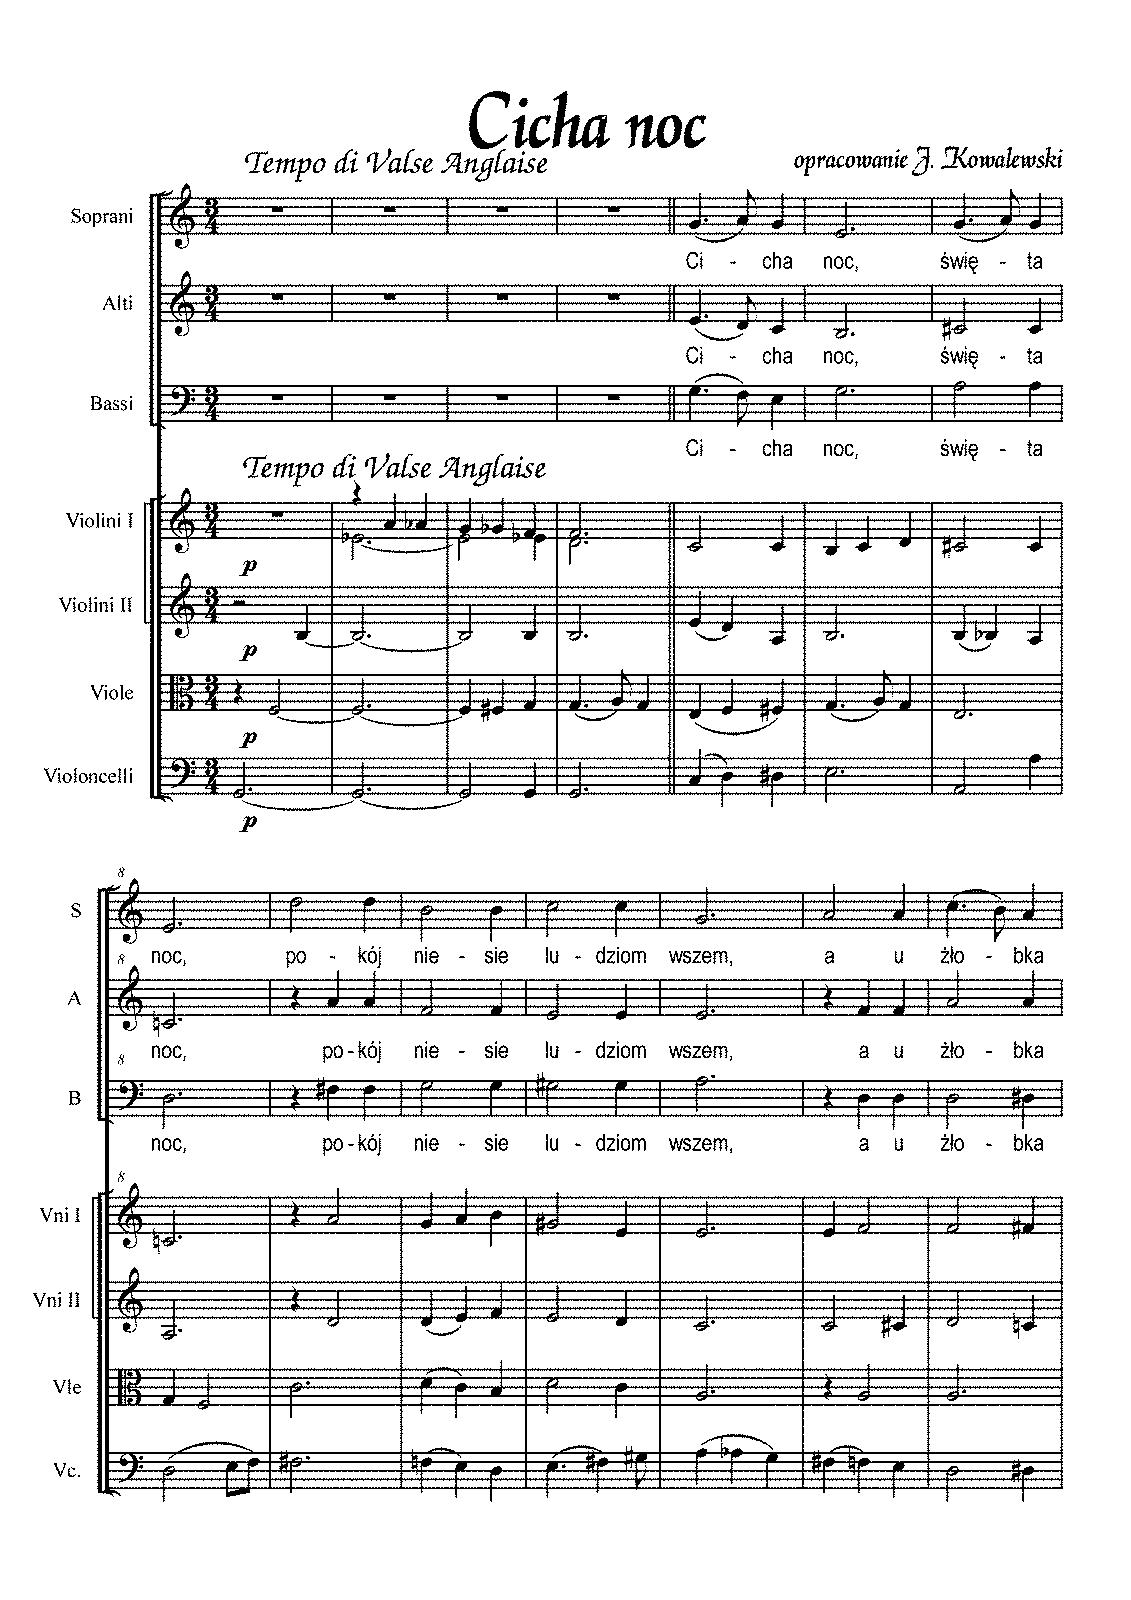 Stille Nacht, Heilige Nacht, H.145 (Gruber, Franz Xaver) - Imslp - Free Printable Sheet Music For Voice And Piano